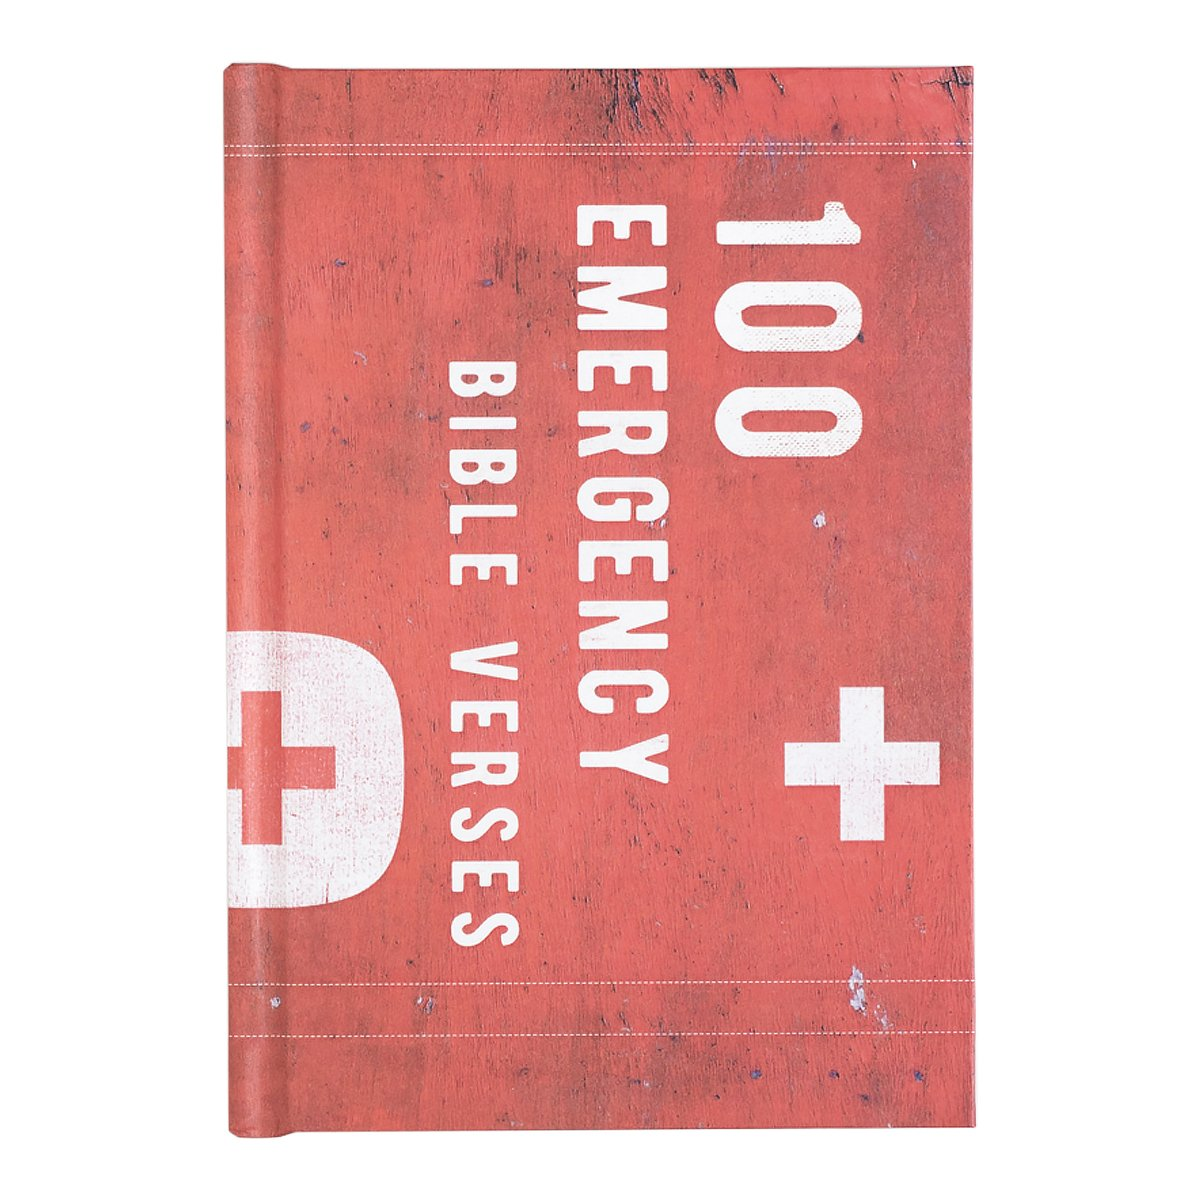 Amazon.com : 100 Emergency Bible Verses - Devotional Book : Office ...